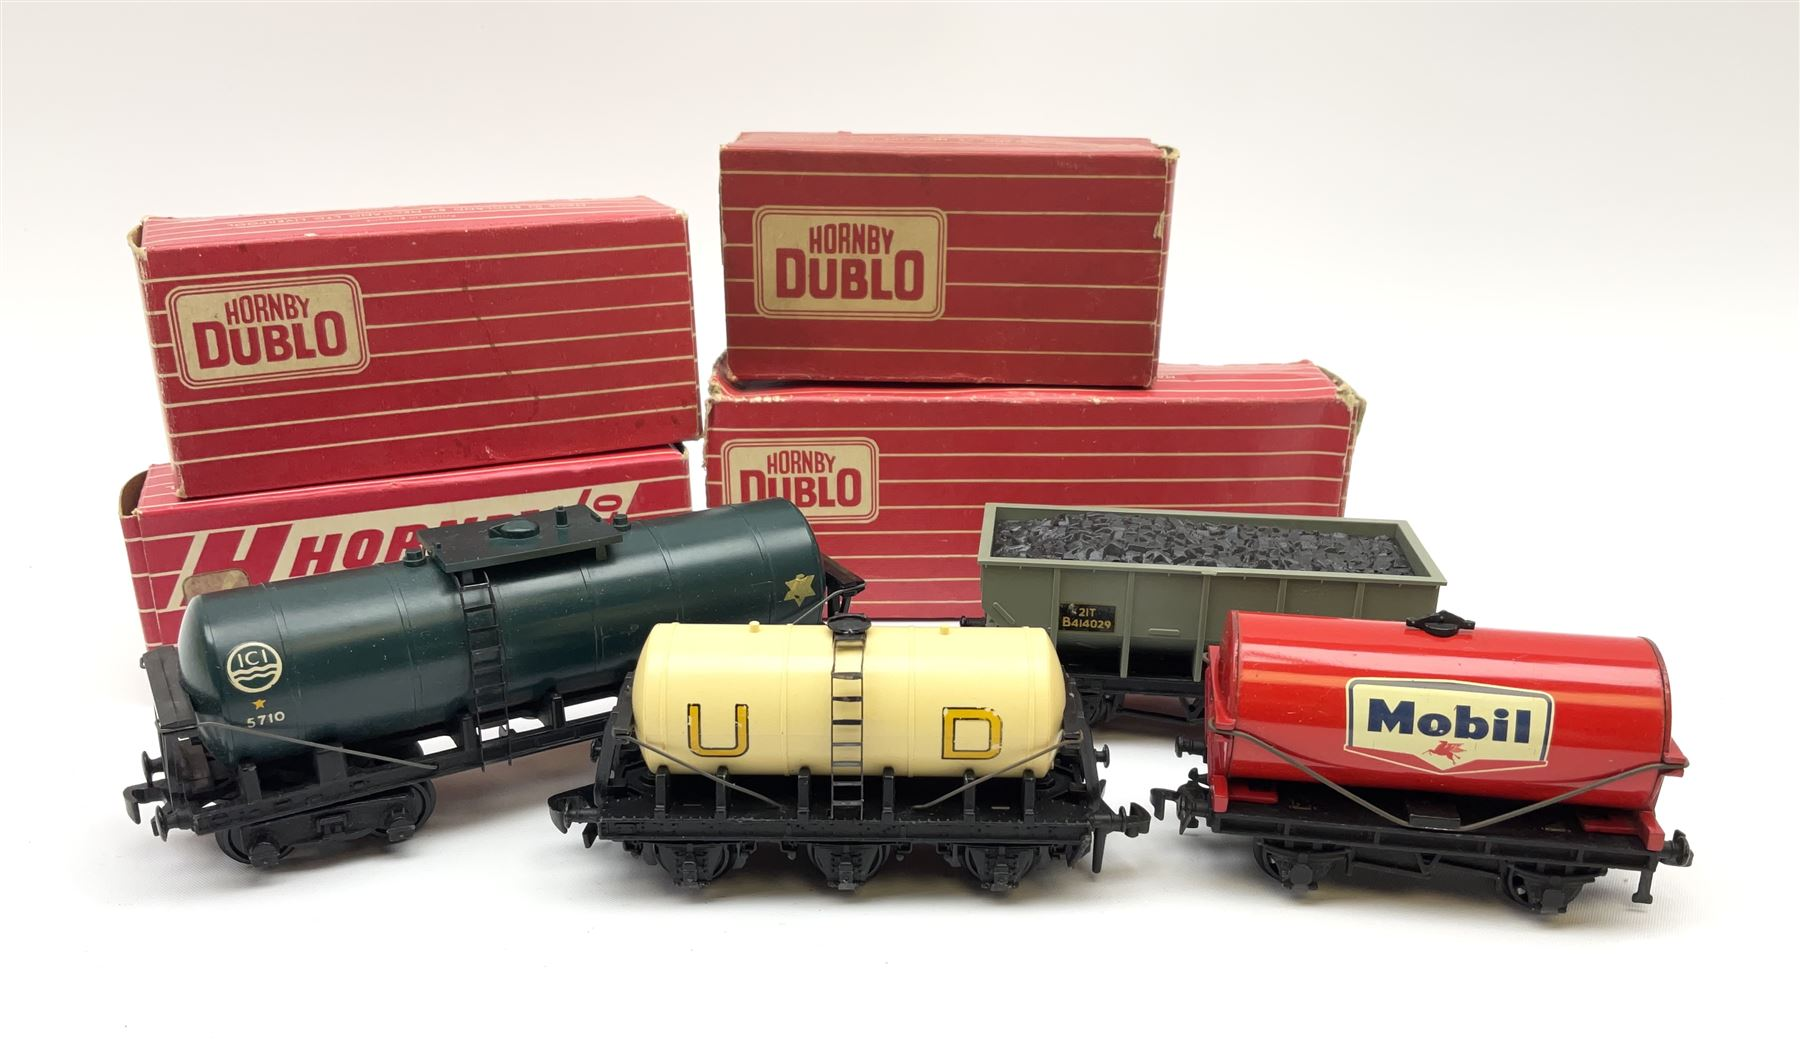 Hornby Dublo - 4685 Caustic Liquor Bogey wagon; 4644 21-Ton Hopper Wagon; 4657 'United Dairies' Milk